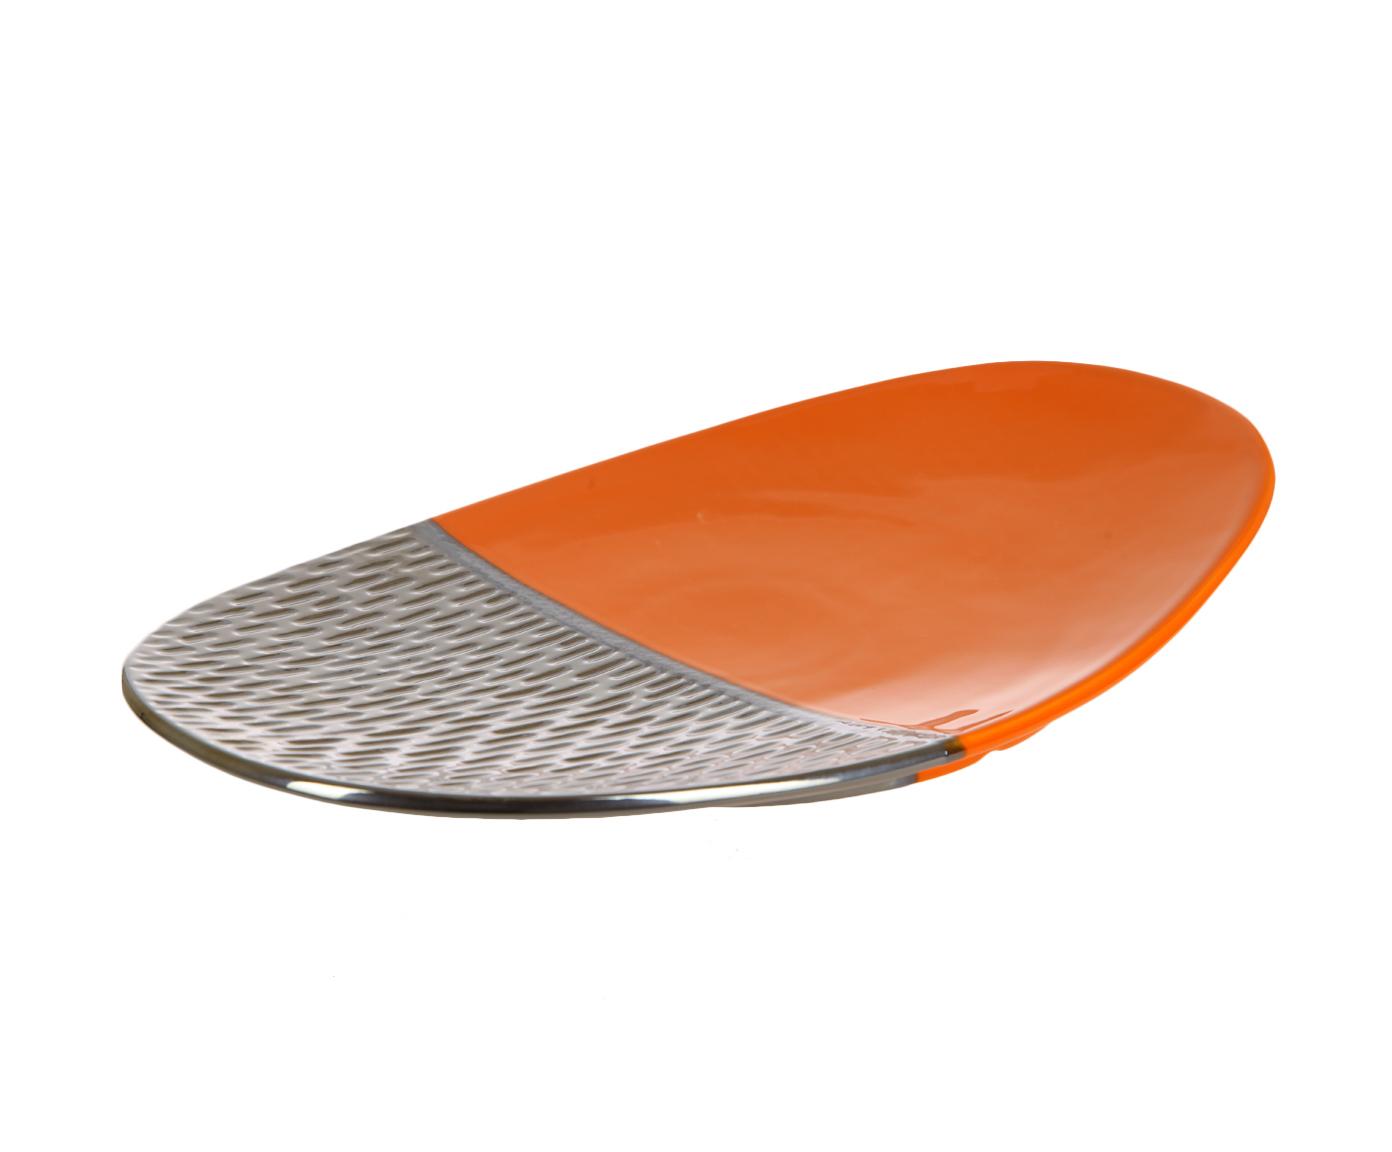 Блюда и тарелки Блюдо декоративное Copperfield оранжевое от Sporvil predmet-dekora-tsentr-copperfield-serebro-s-oranzhevym-ot-sporvil-portugaliya.jpg